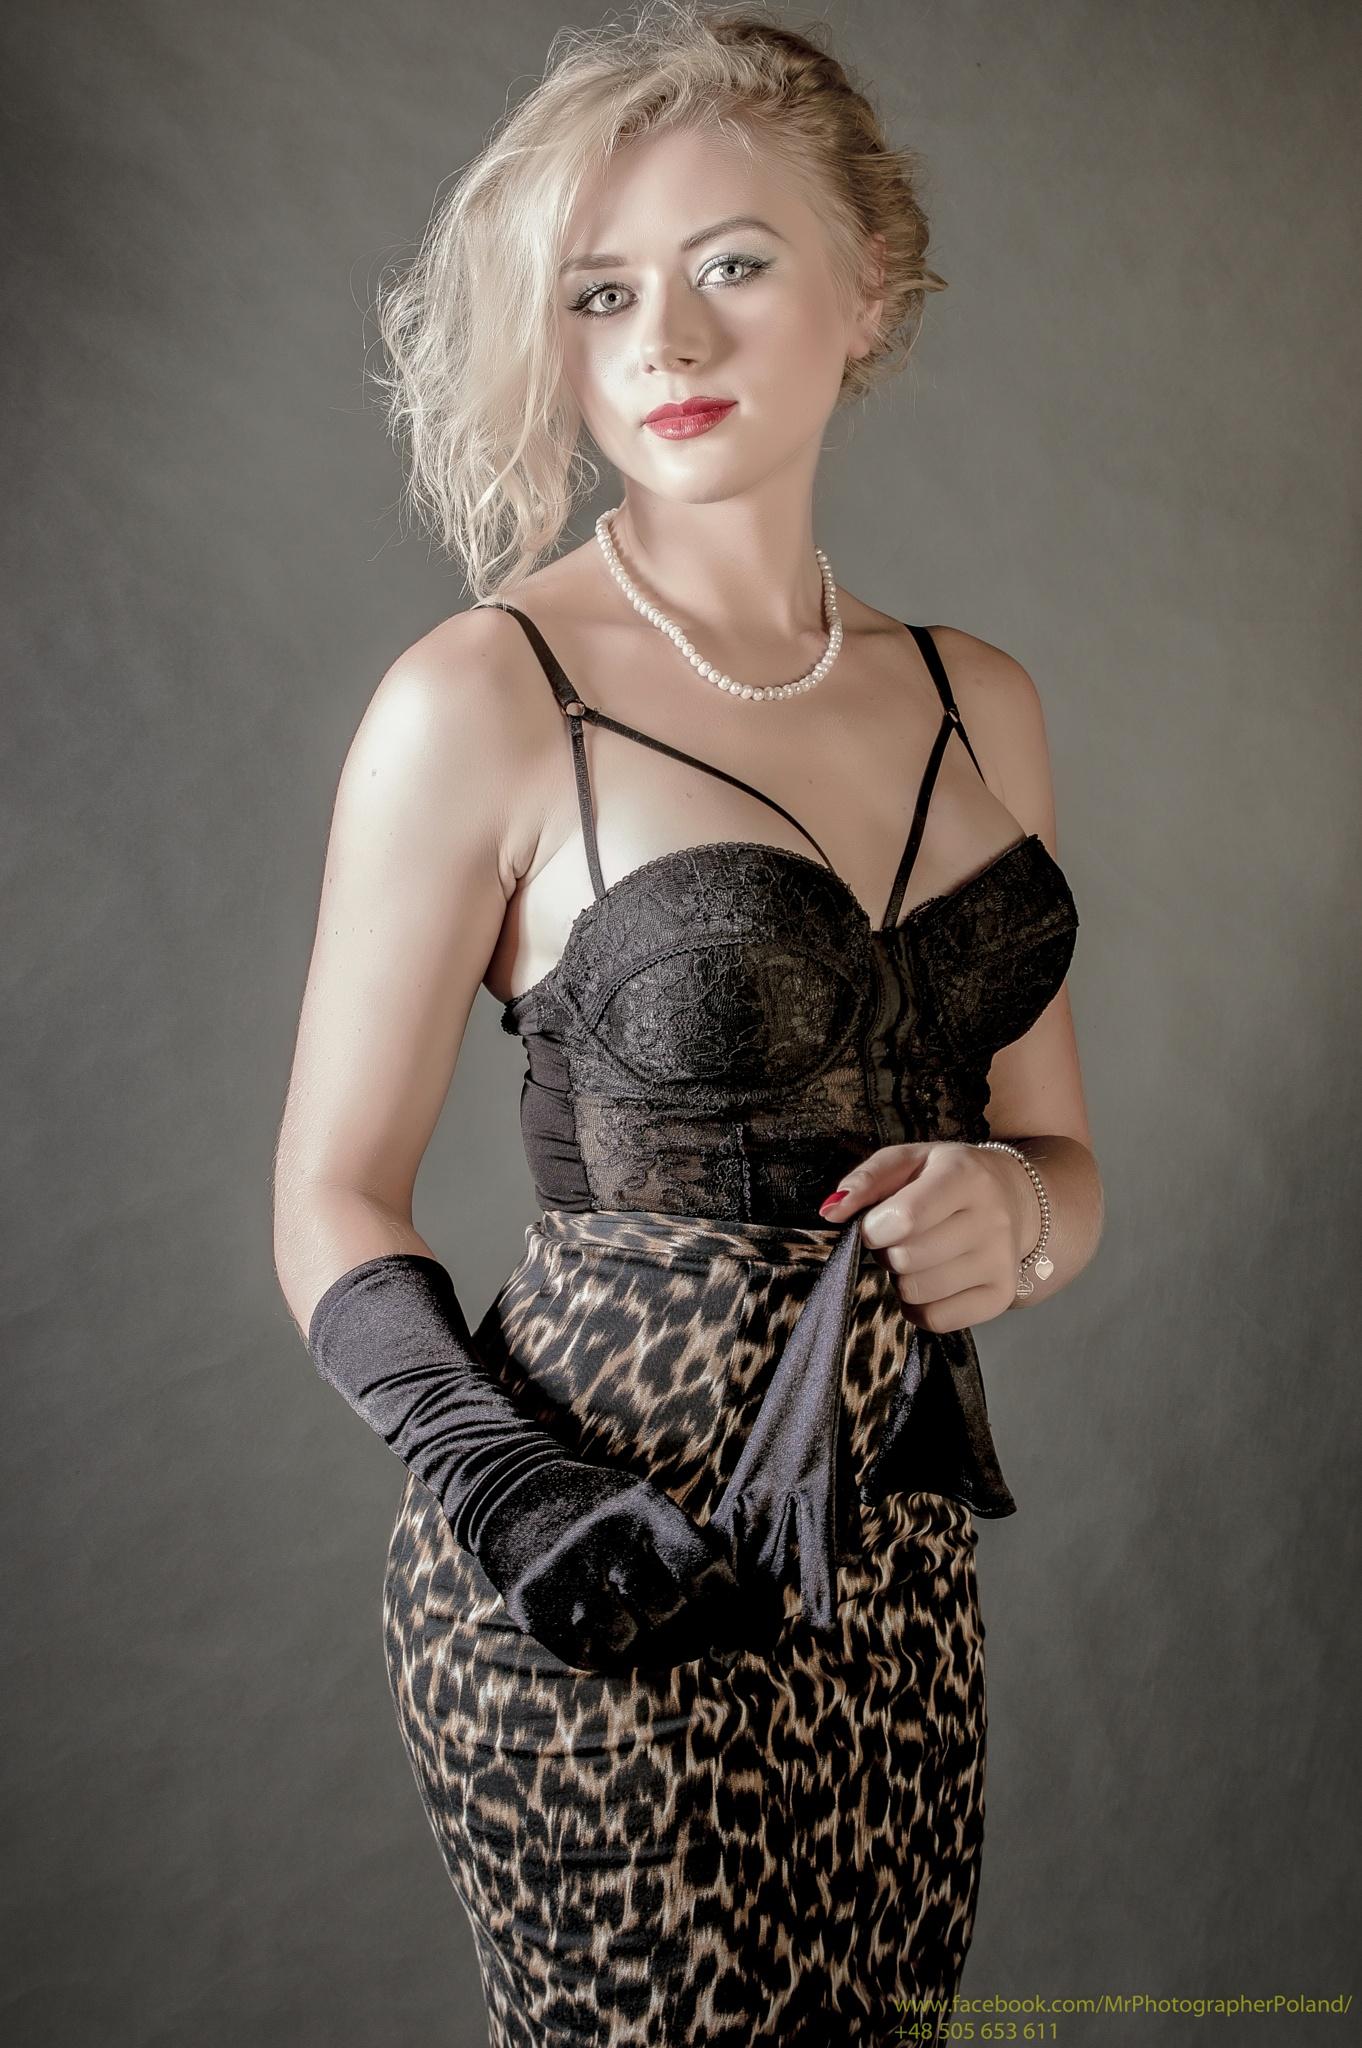 Black glove by PanFotograf